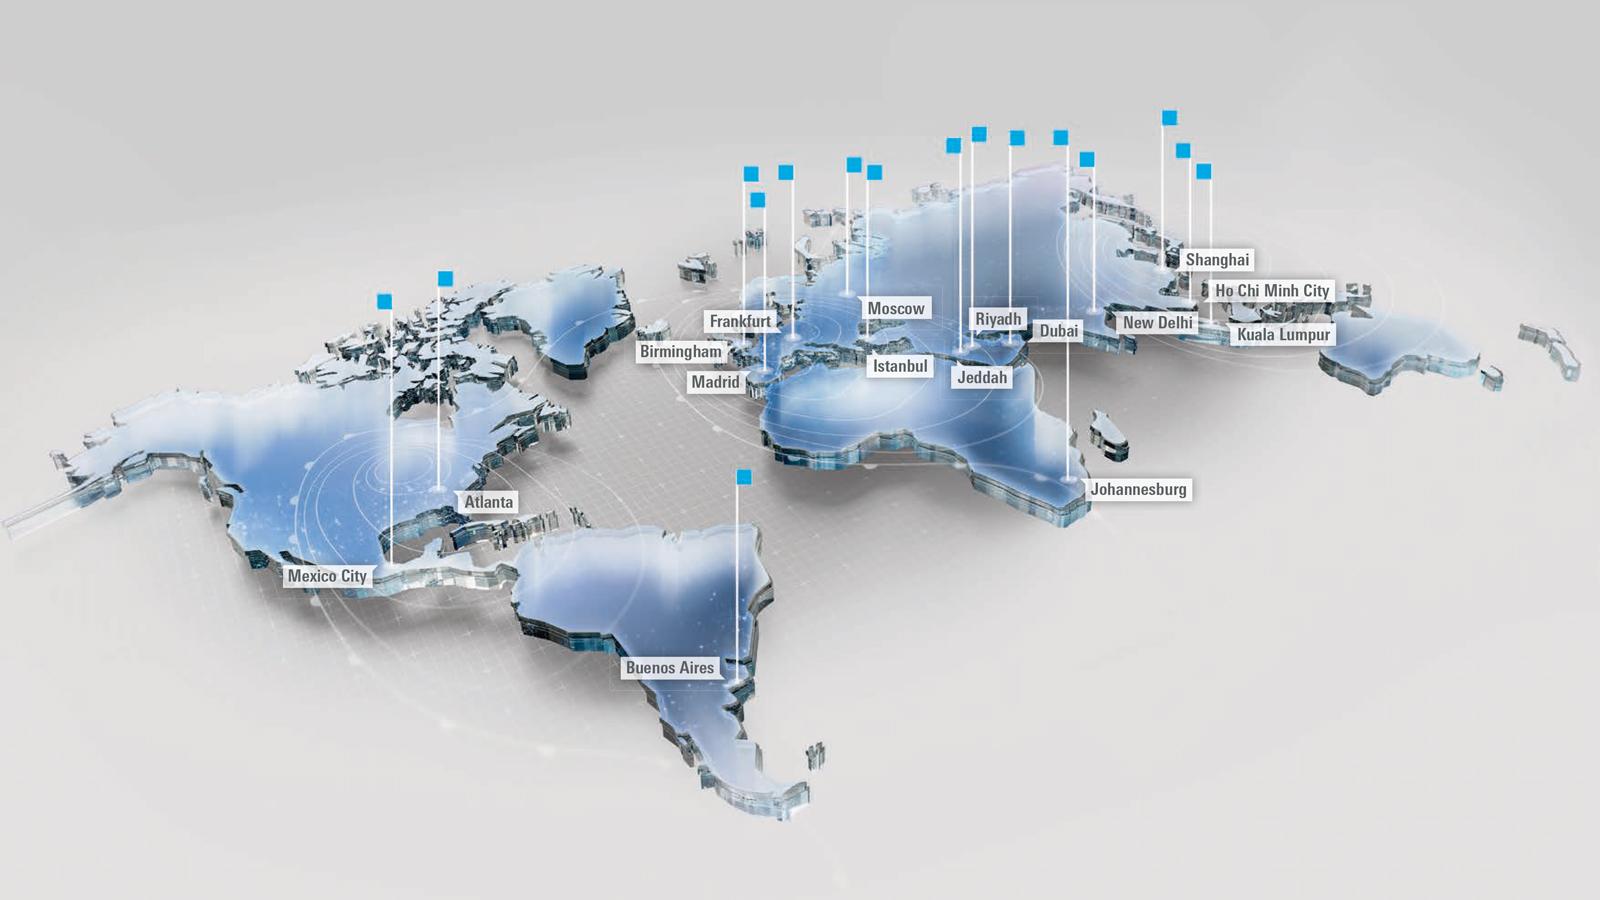 Automechanika Dubai Leading International Trade Show For The Automotive Service Industry In The Mea Region